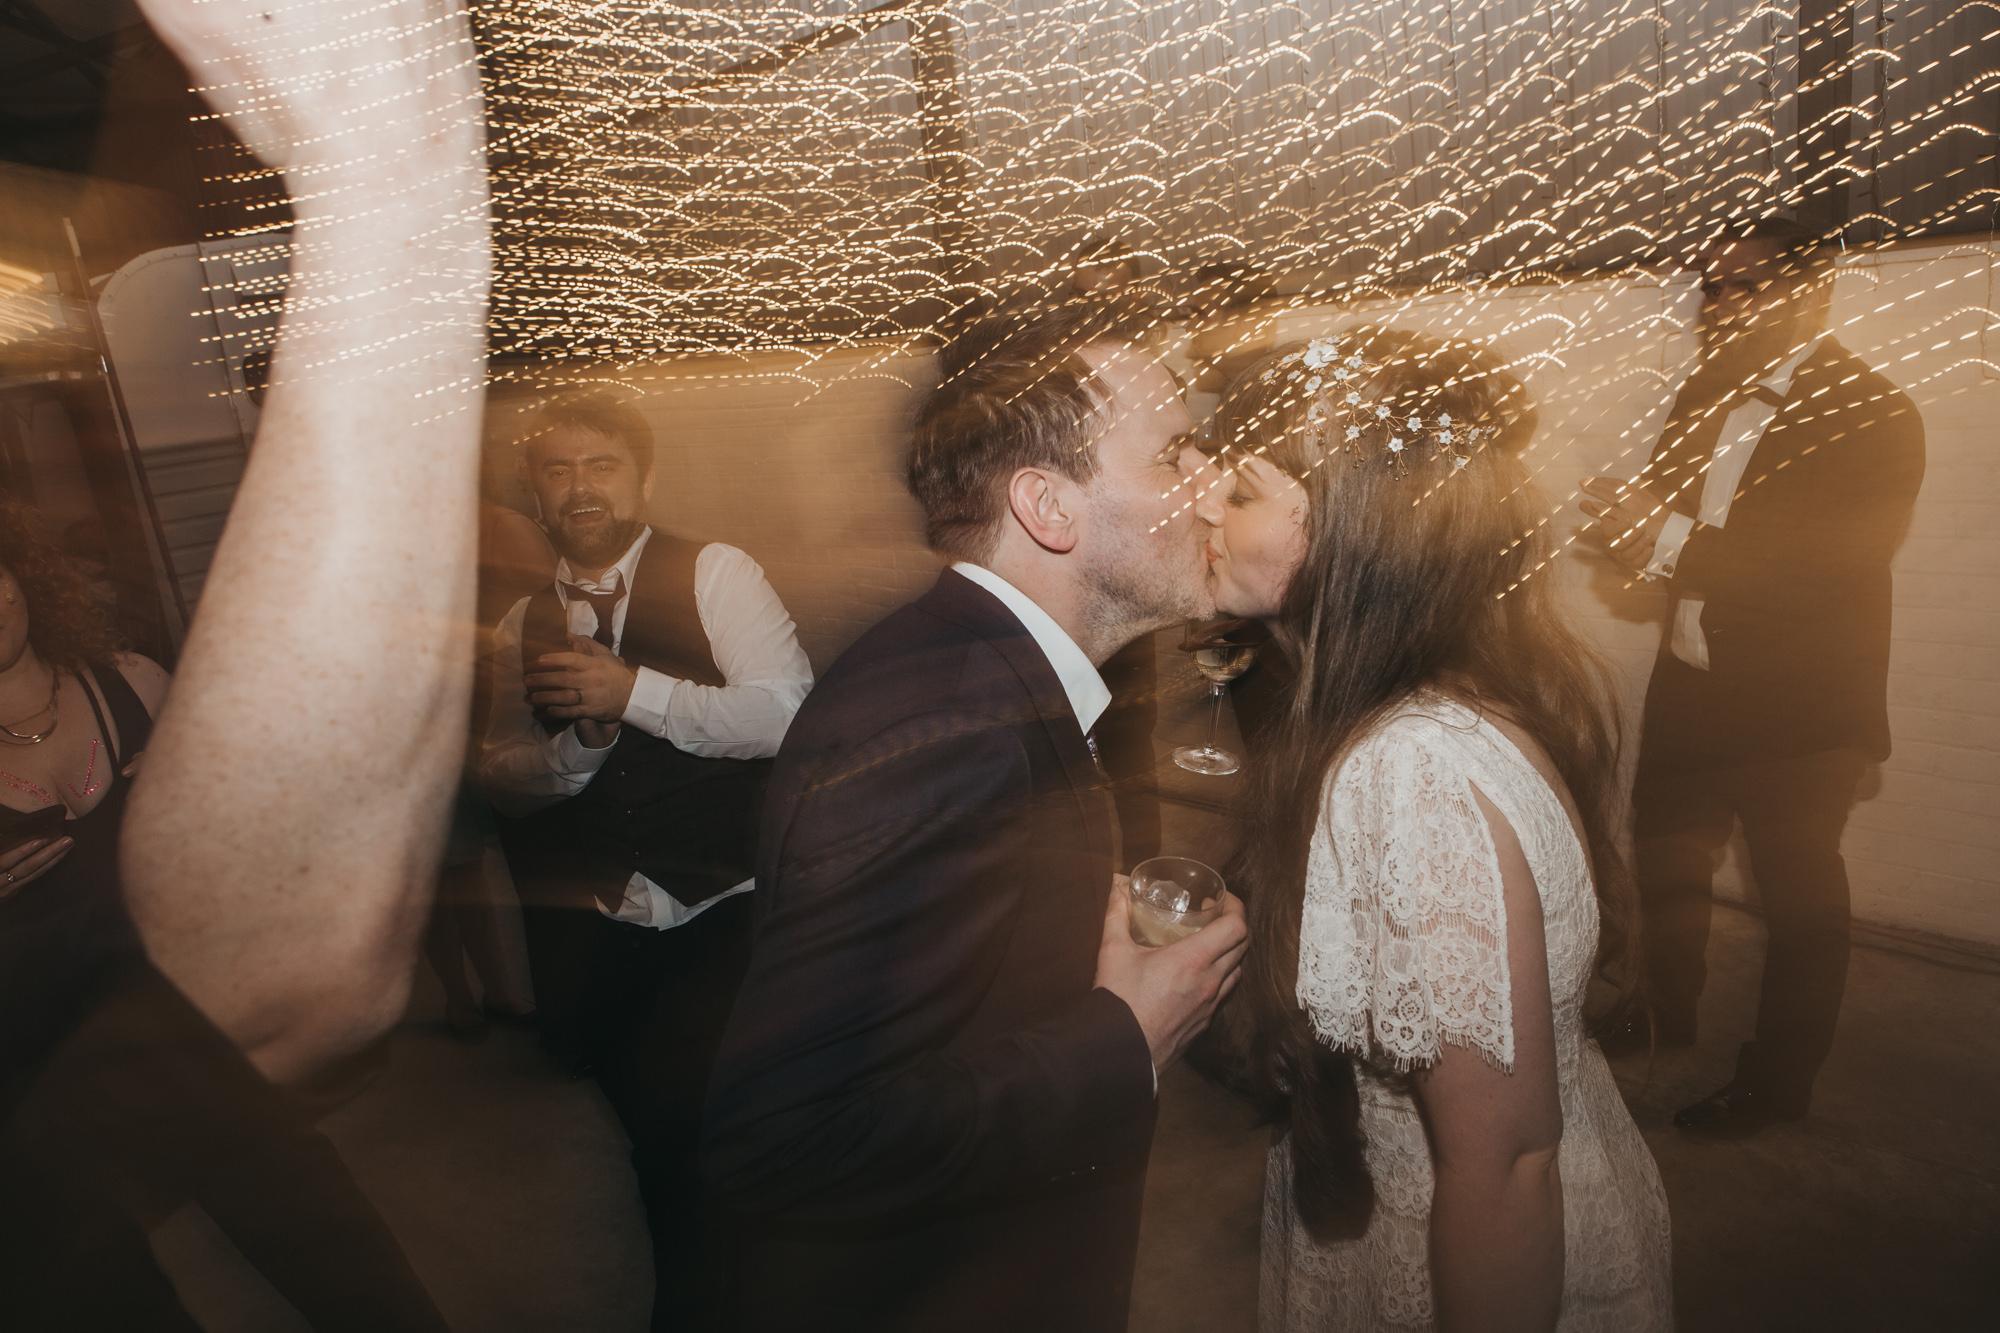 Kristy-Back-Garden-Outdoor-Wedding-Sheffield-Industrial-Warehouse-Wedding-Bohemian-Kate-Beaumont-Dahlia-Dress-58.jpg